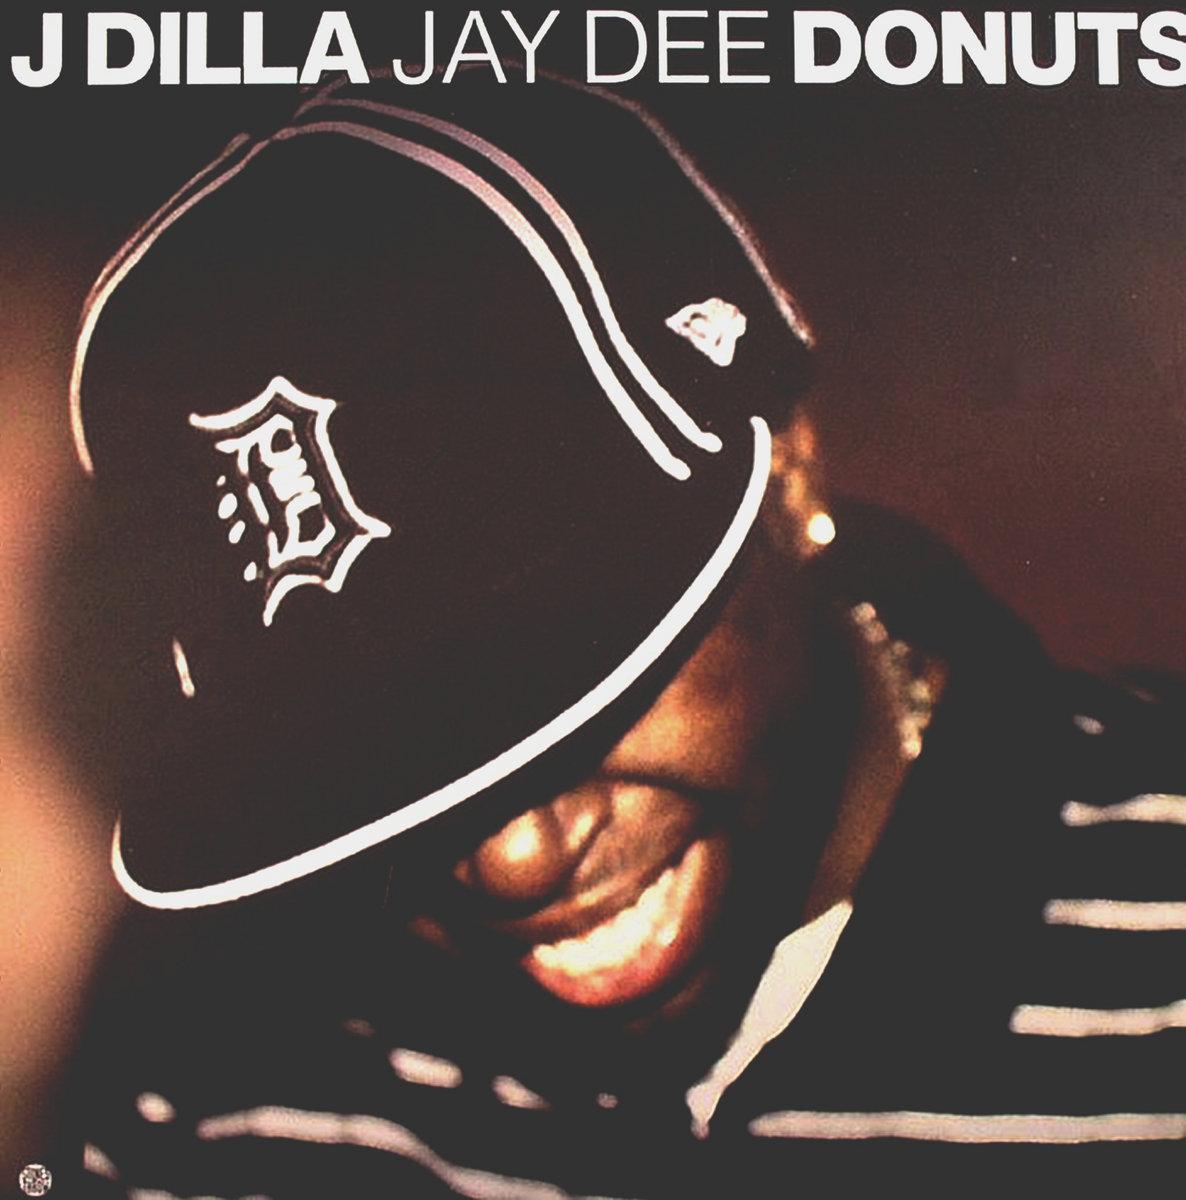 The Nodball Review: J Dilla (Jay Dee) – Donuts